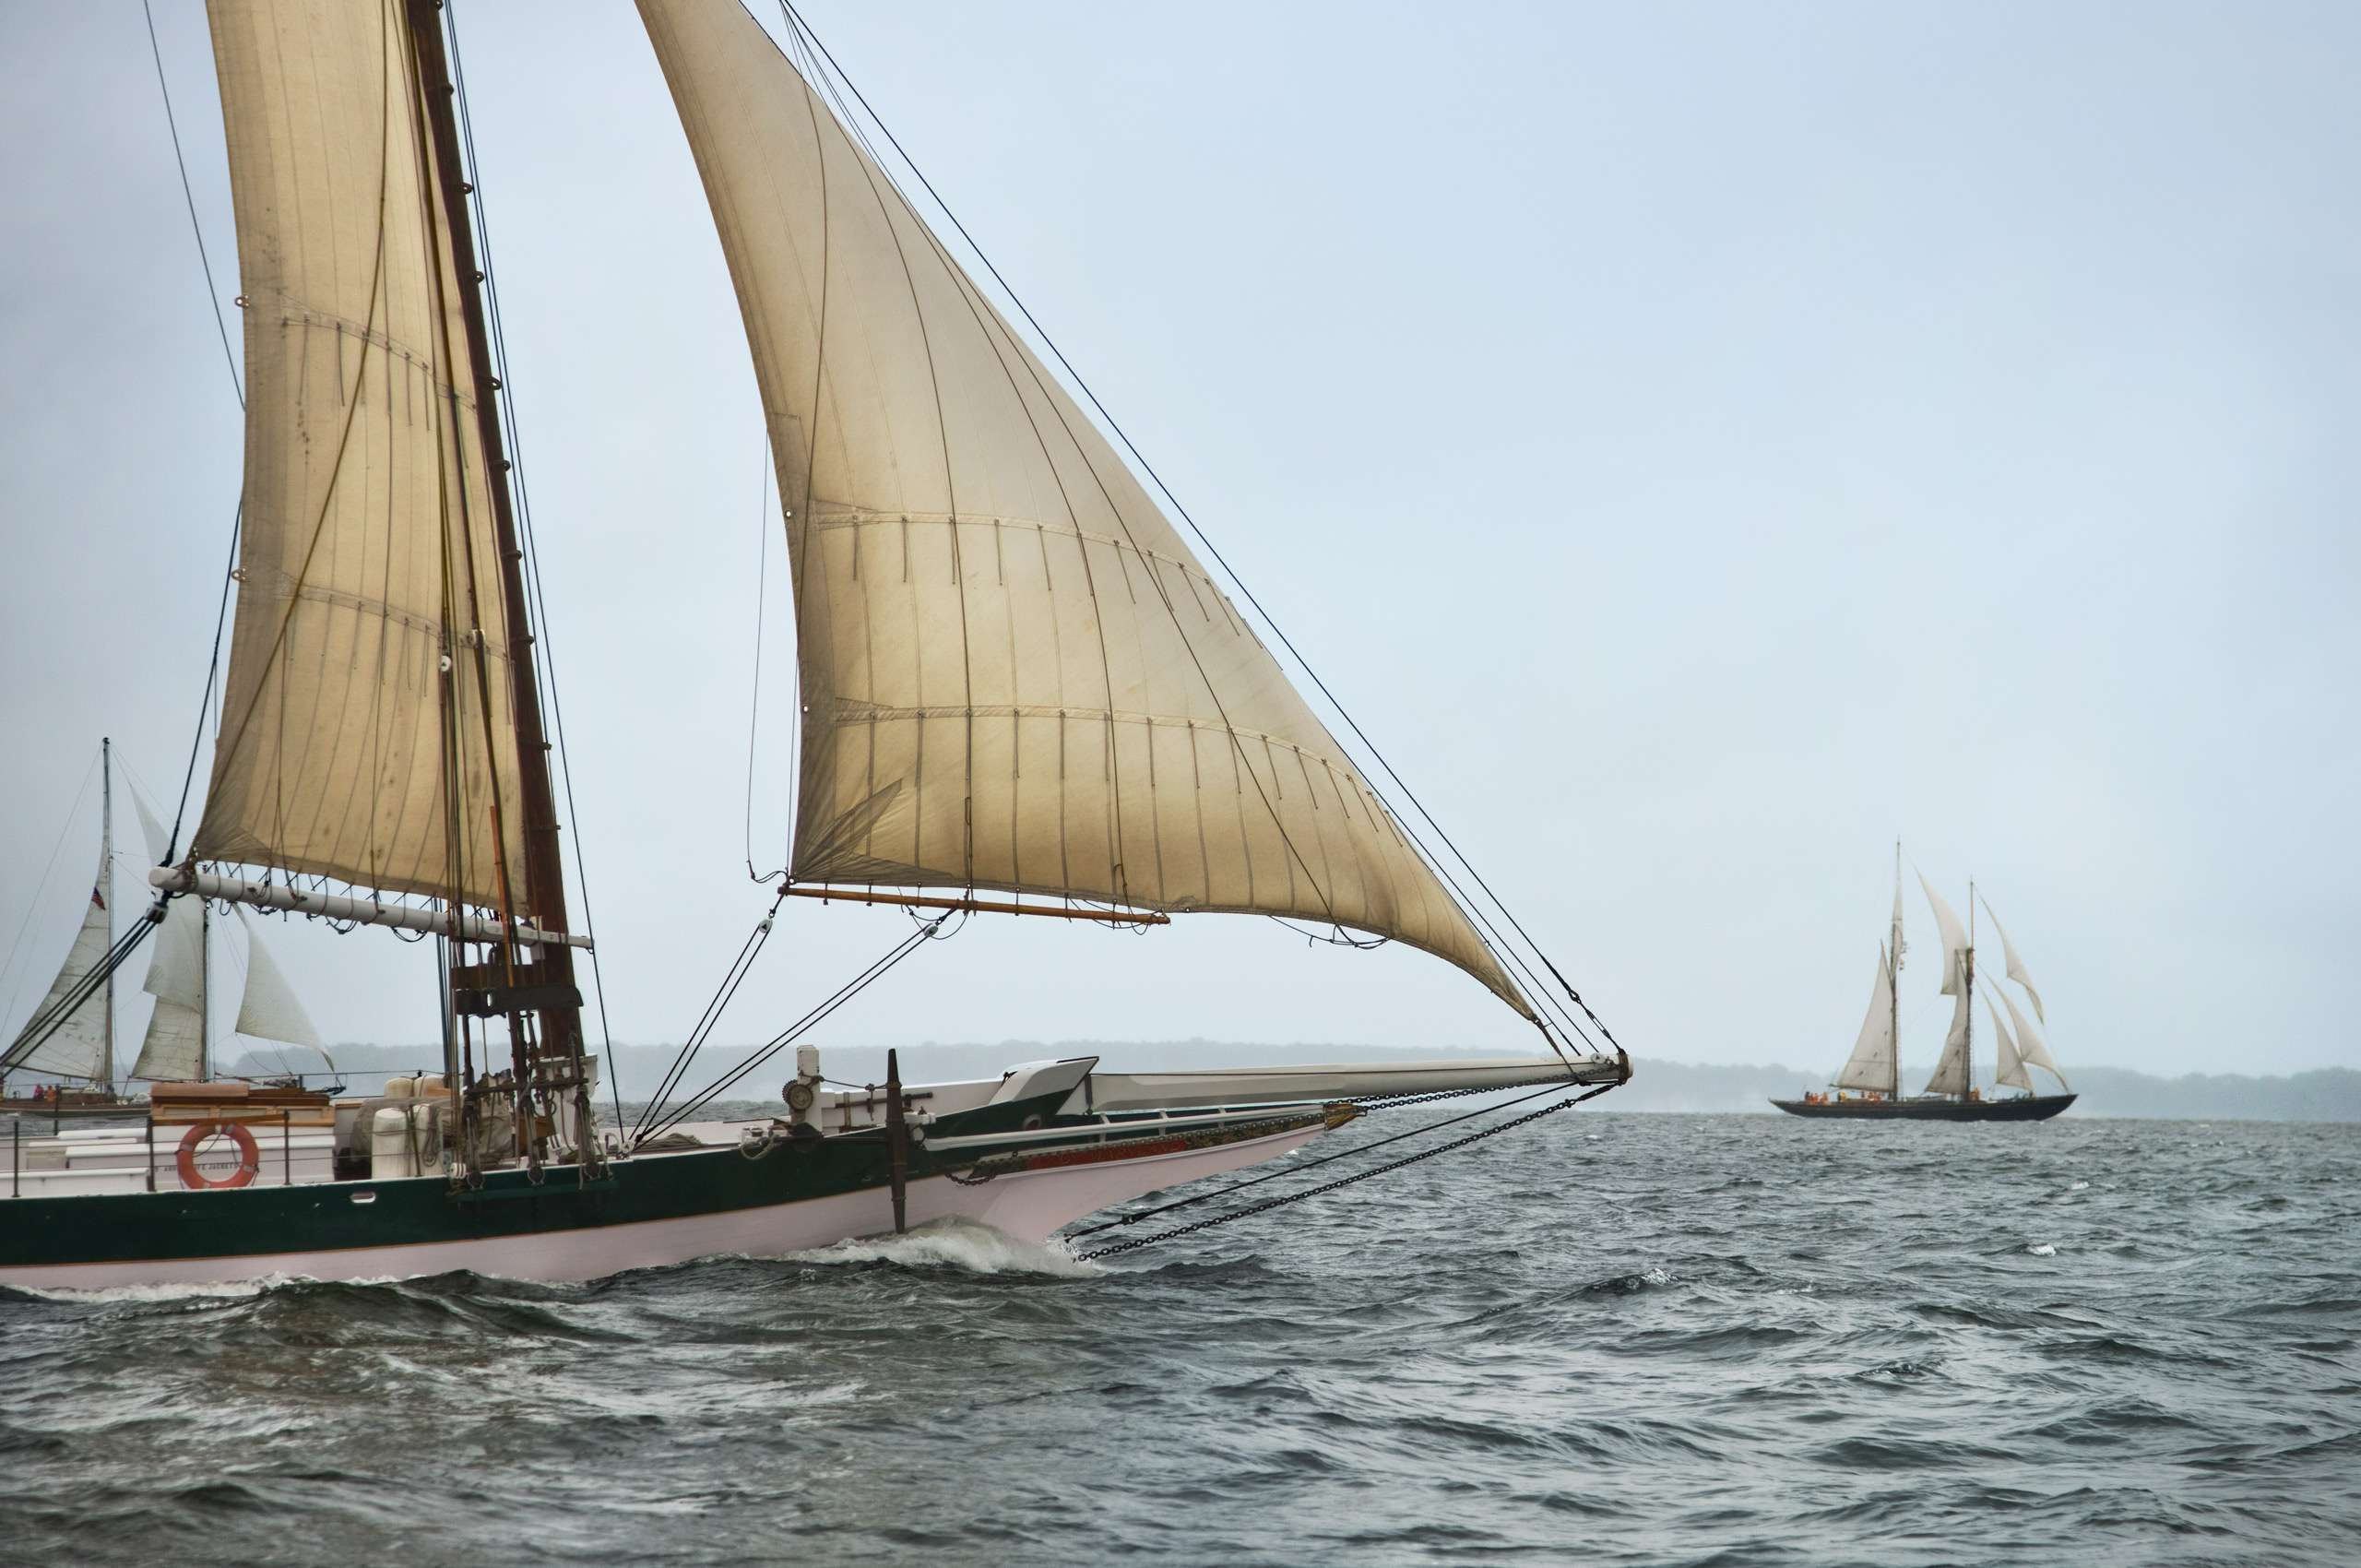 PORTFOLIO - Sailing - Tall Ships #4 - PCG598